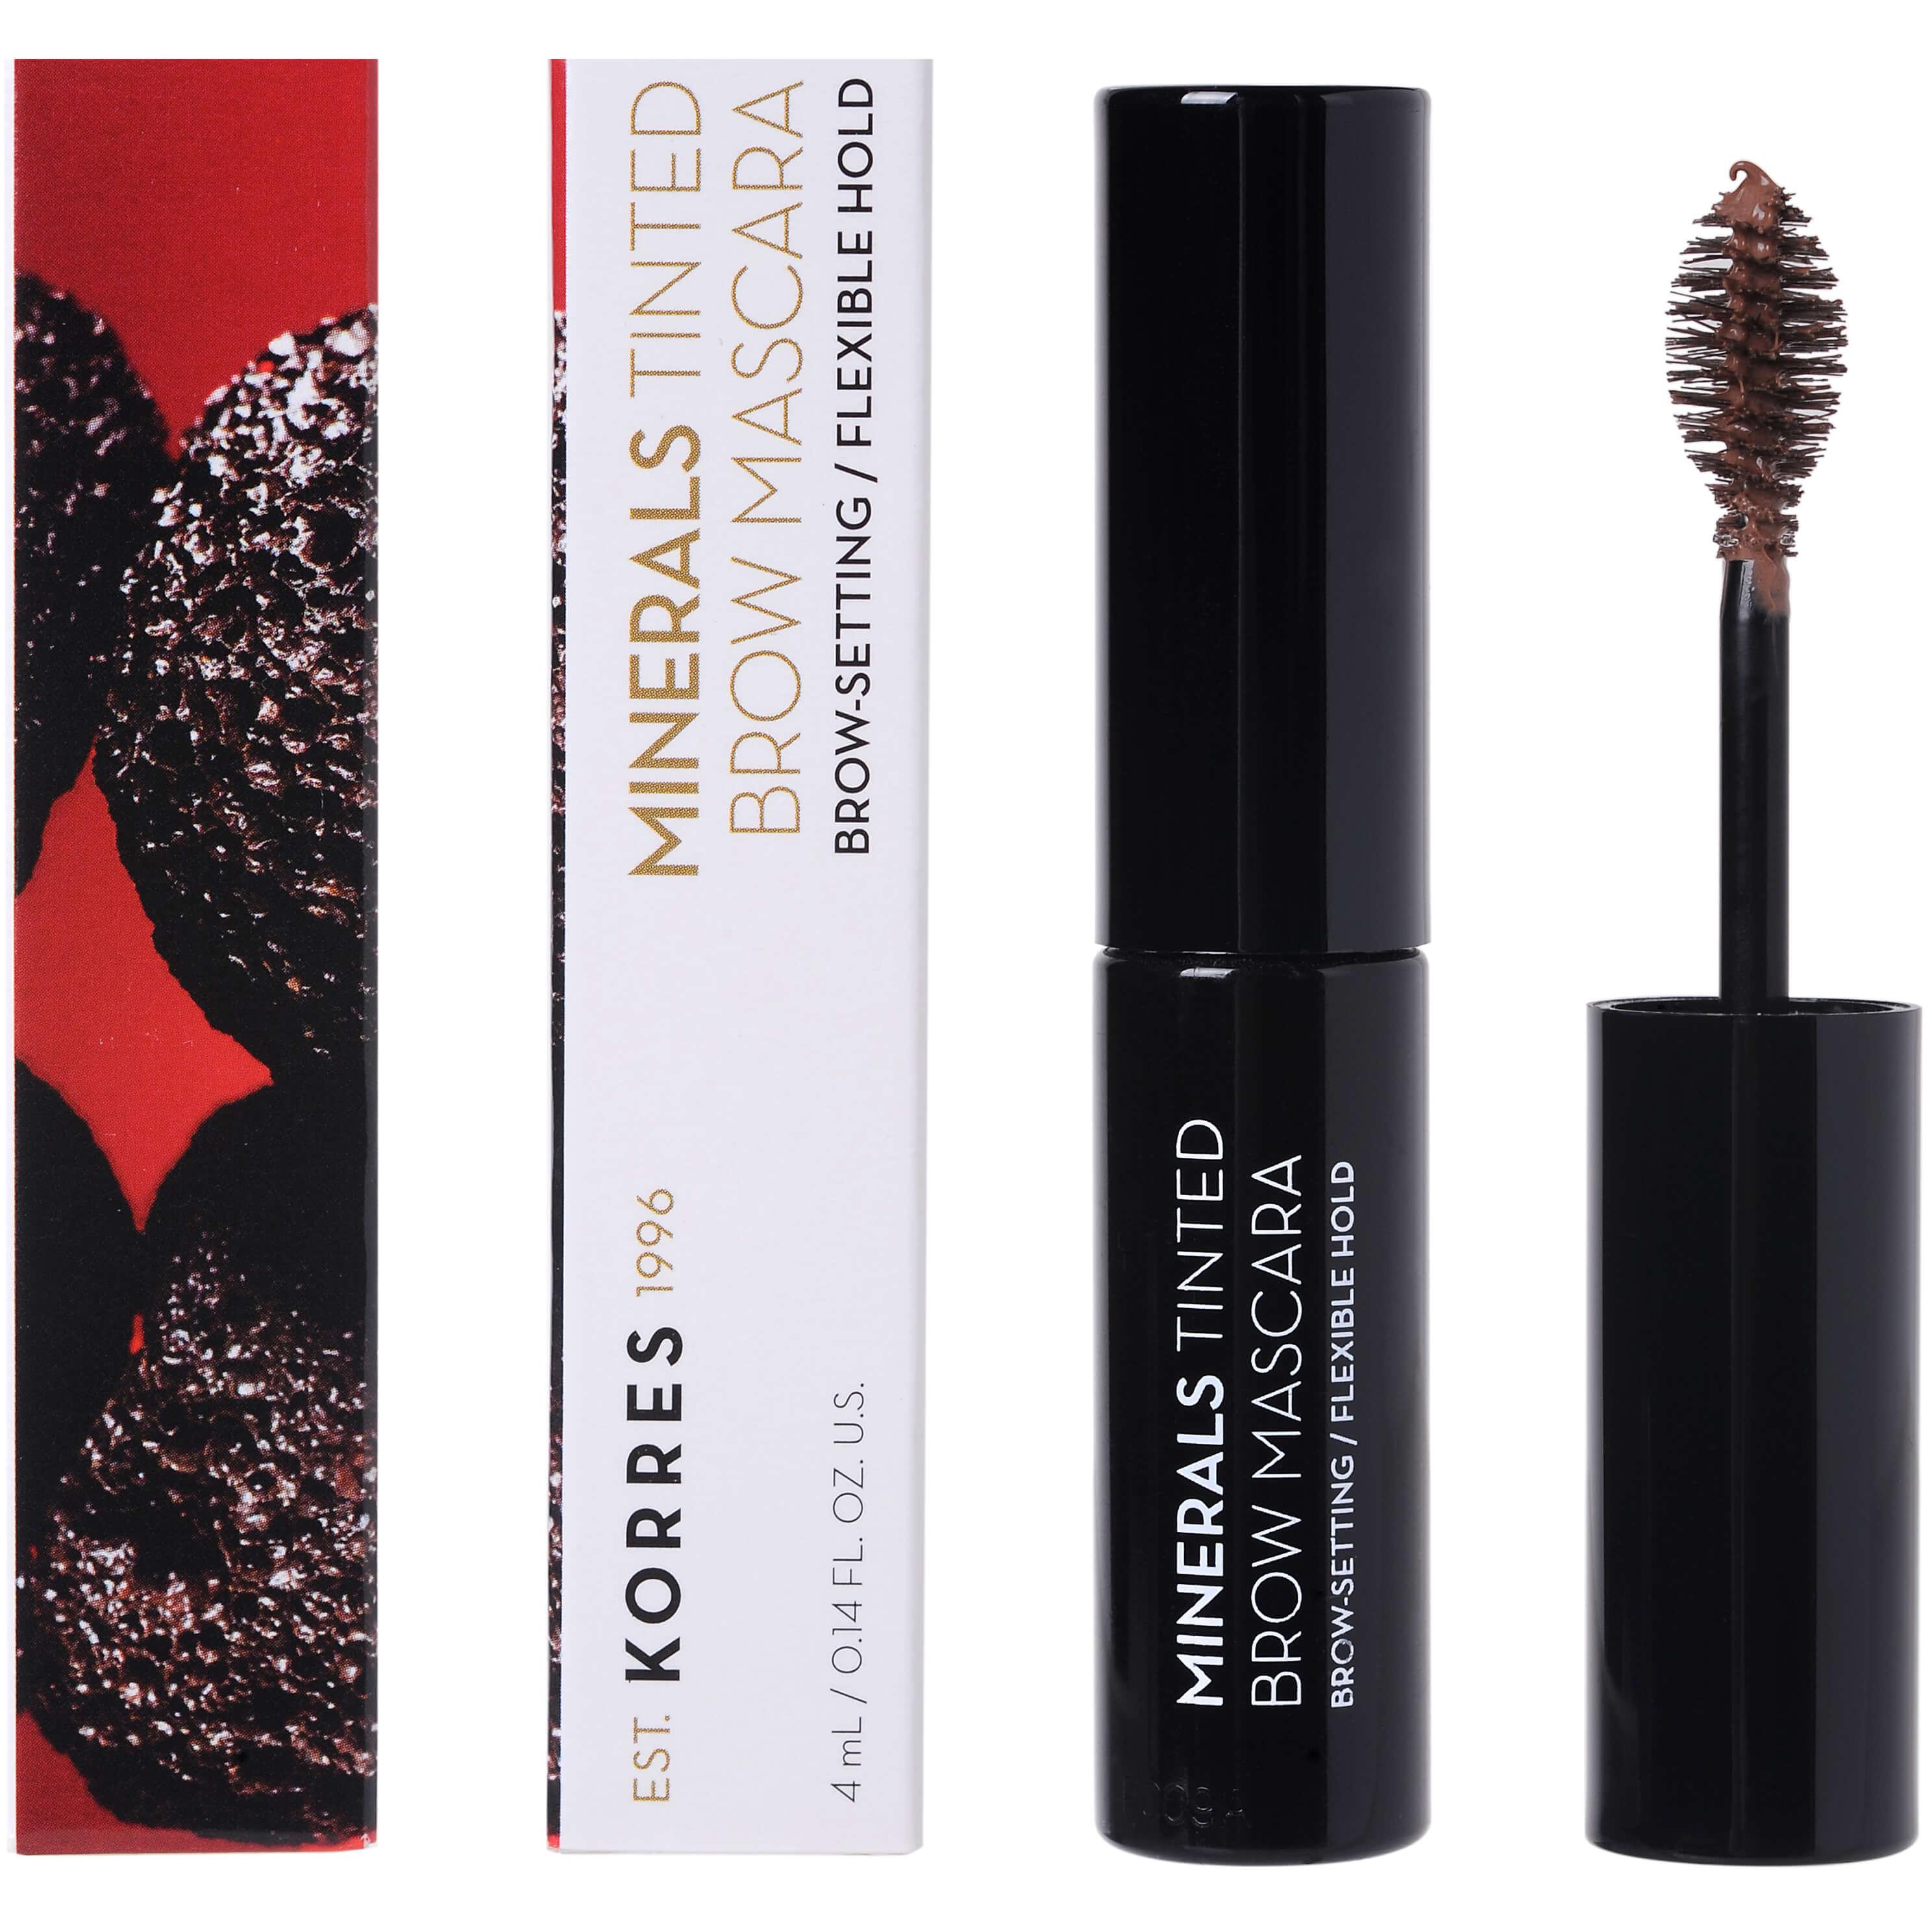 Korres Minerals Tinted EyeBrow Mascara Μάσκαρα Φρυδιών που Διαμορφώνει, Χρωματίζει & Σταθεροποιεί τα Φρύδια 4ml – 02 Medium Shade